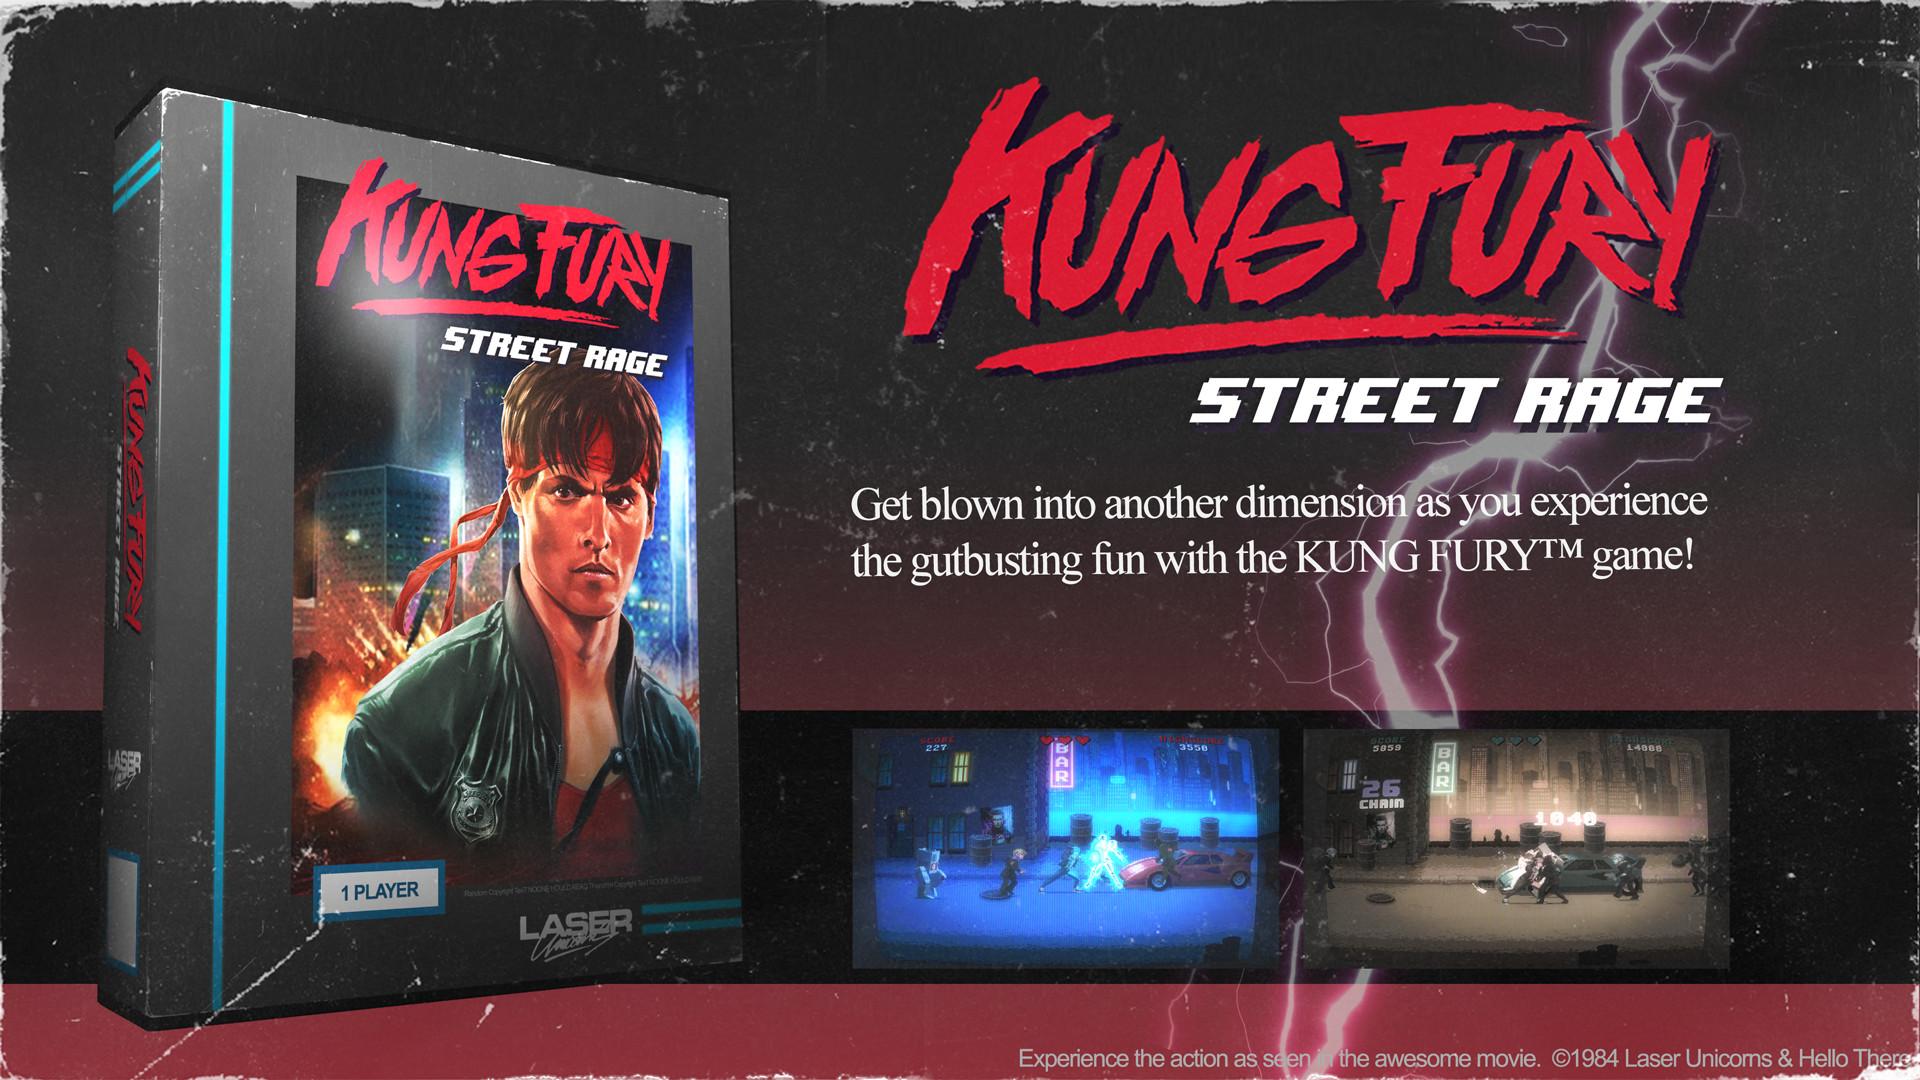 Kung Fury - Página 2 Ss_44fb01be3db8ec7f6894a7c3f6360f2bb6a6eca5.1920x1080